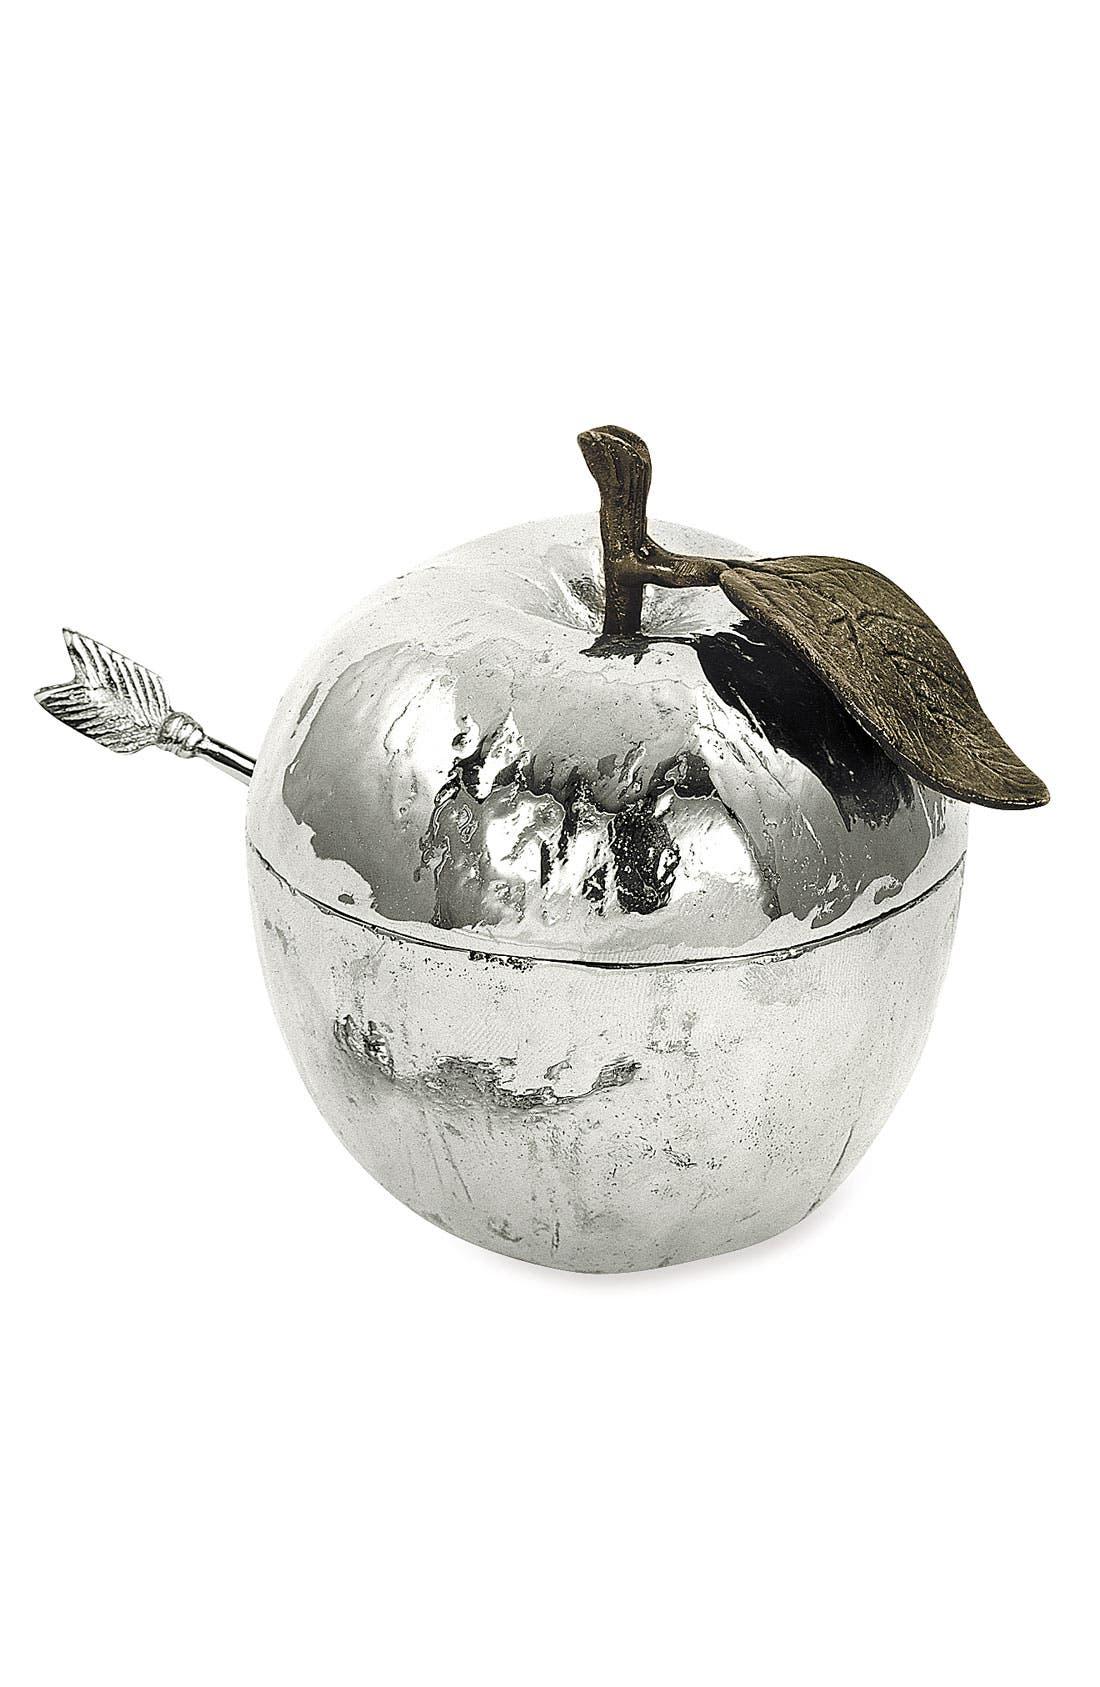 Alternate Image 1 Selected - Michael Aram 'Apple' Honey Pot with Spoon